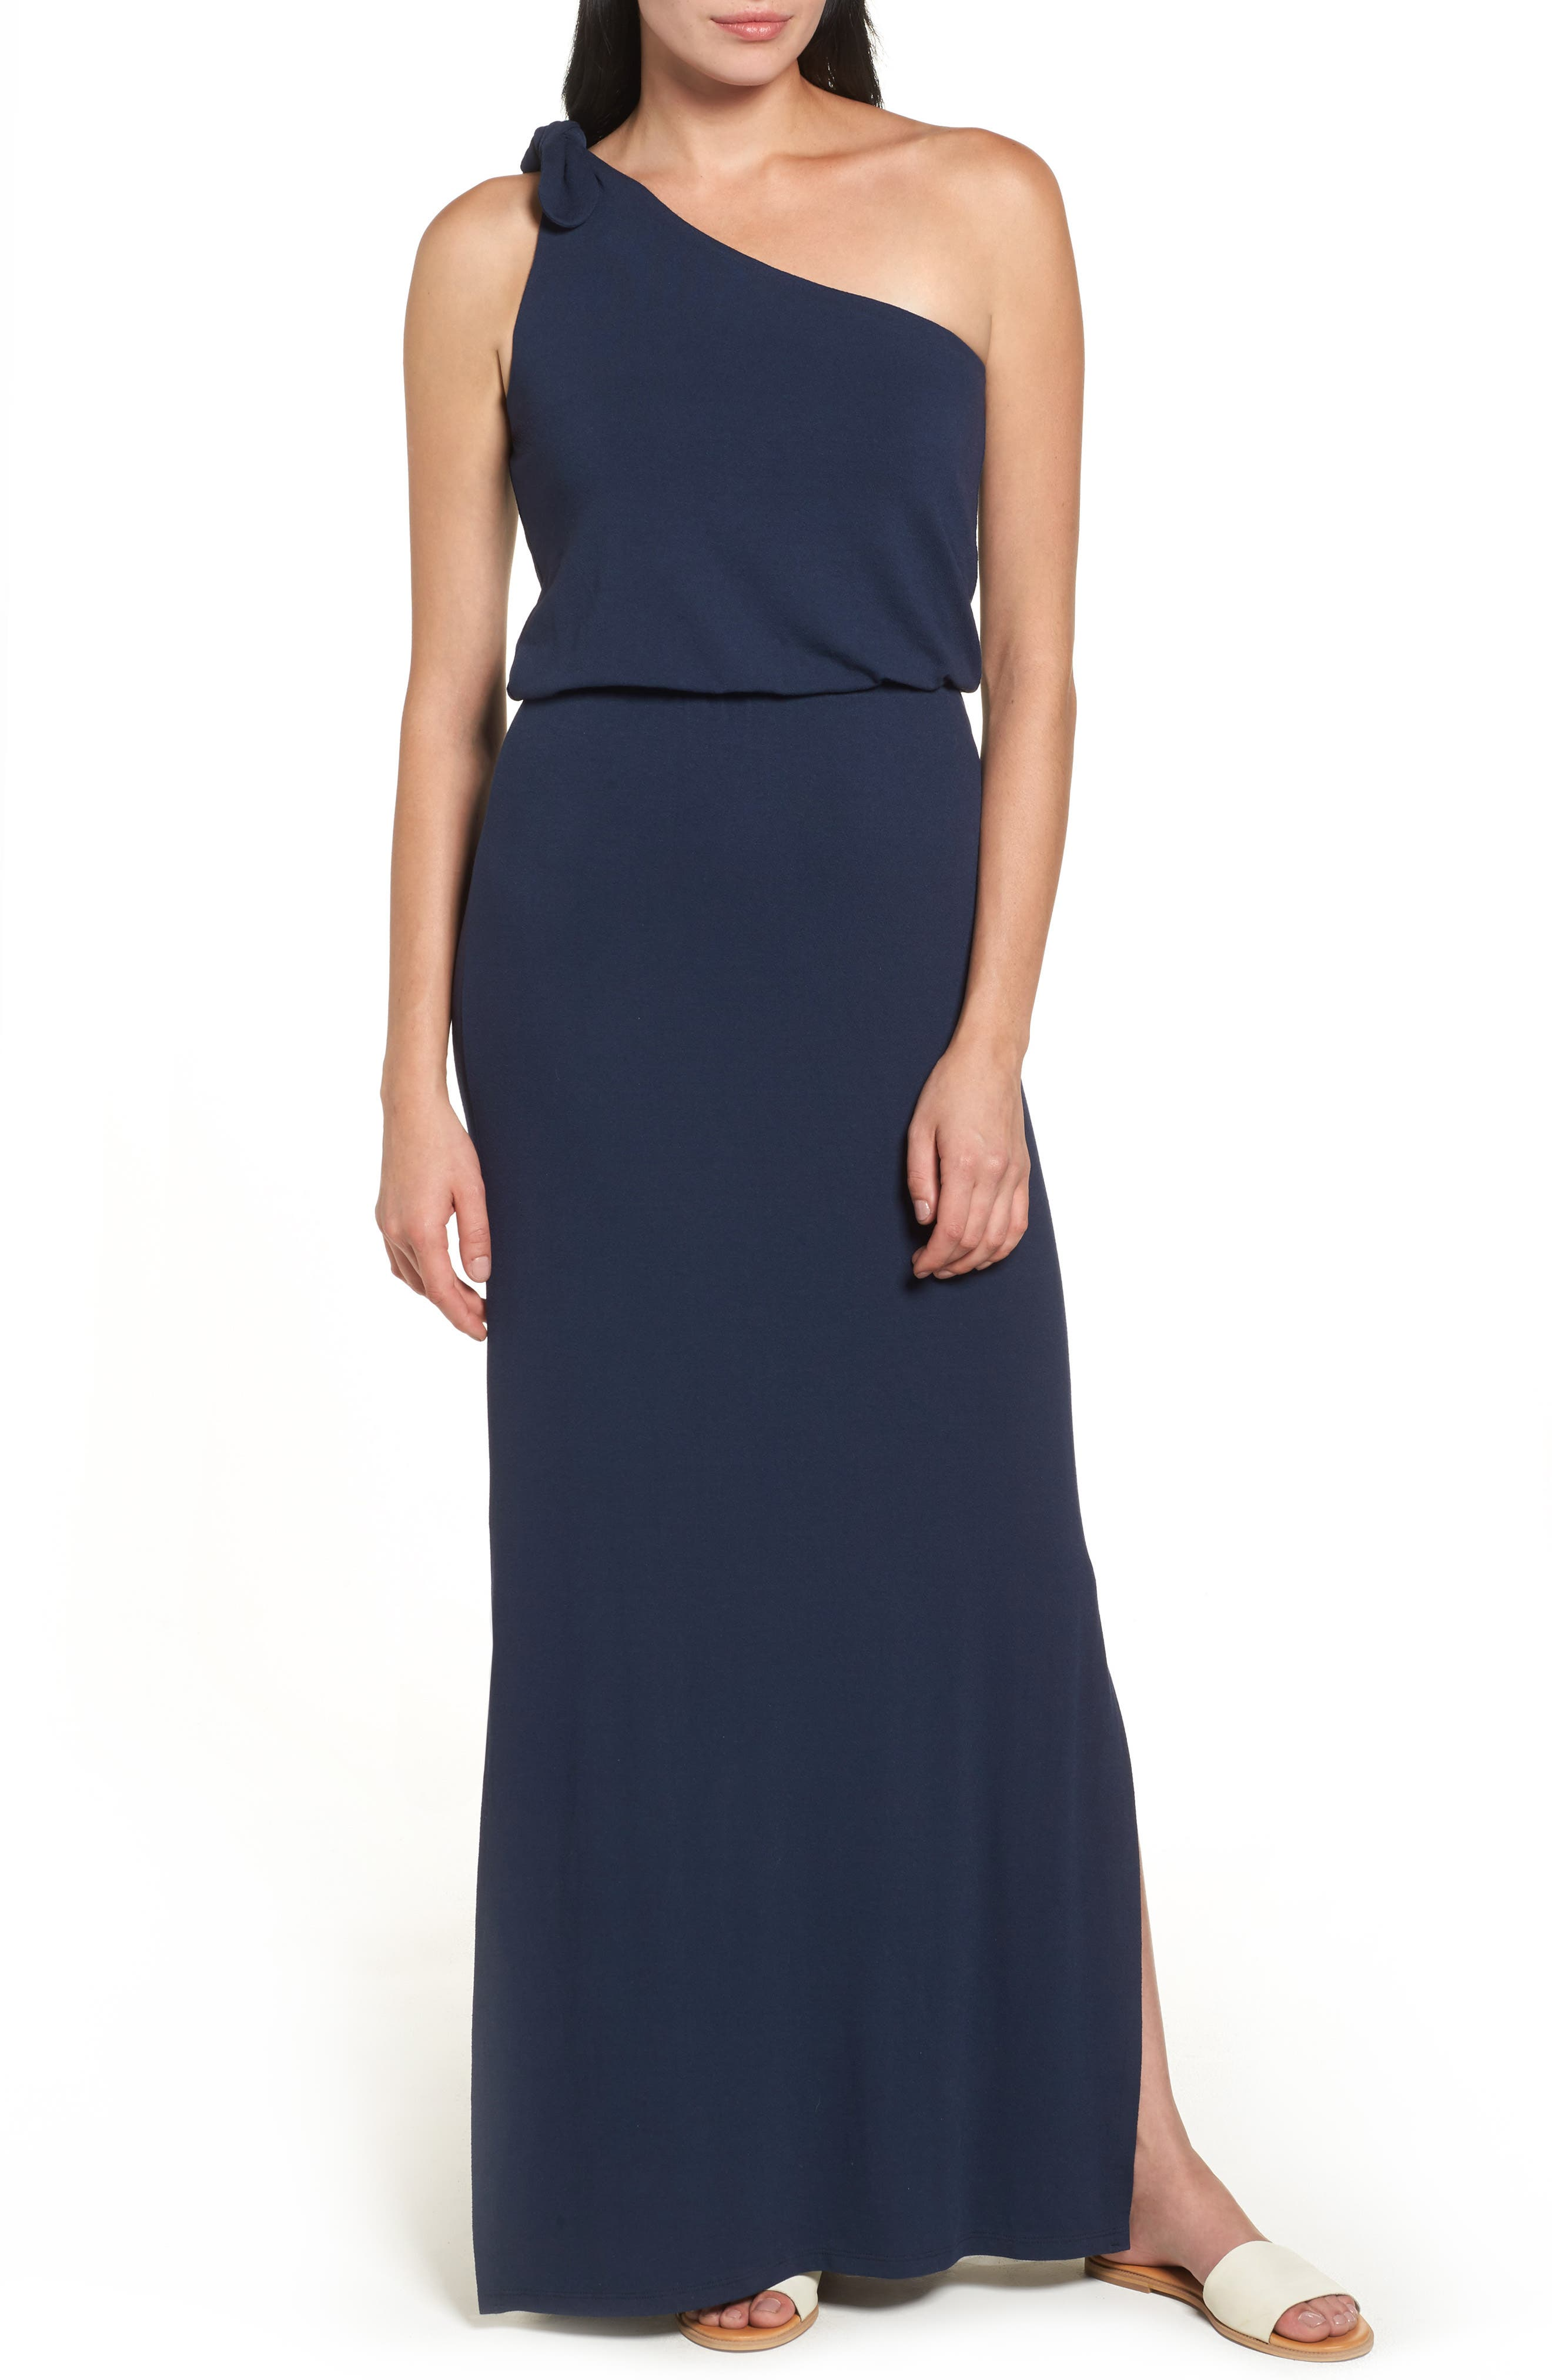 Bobeau One-Shoulder Maxi Dress